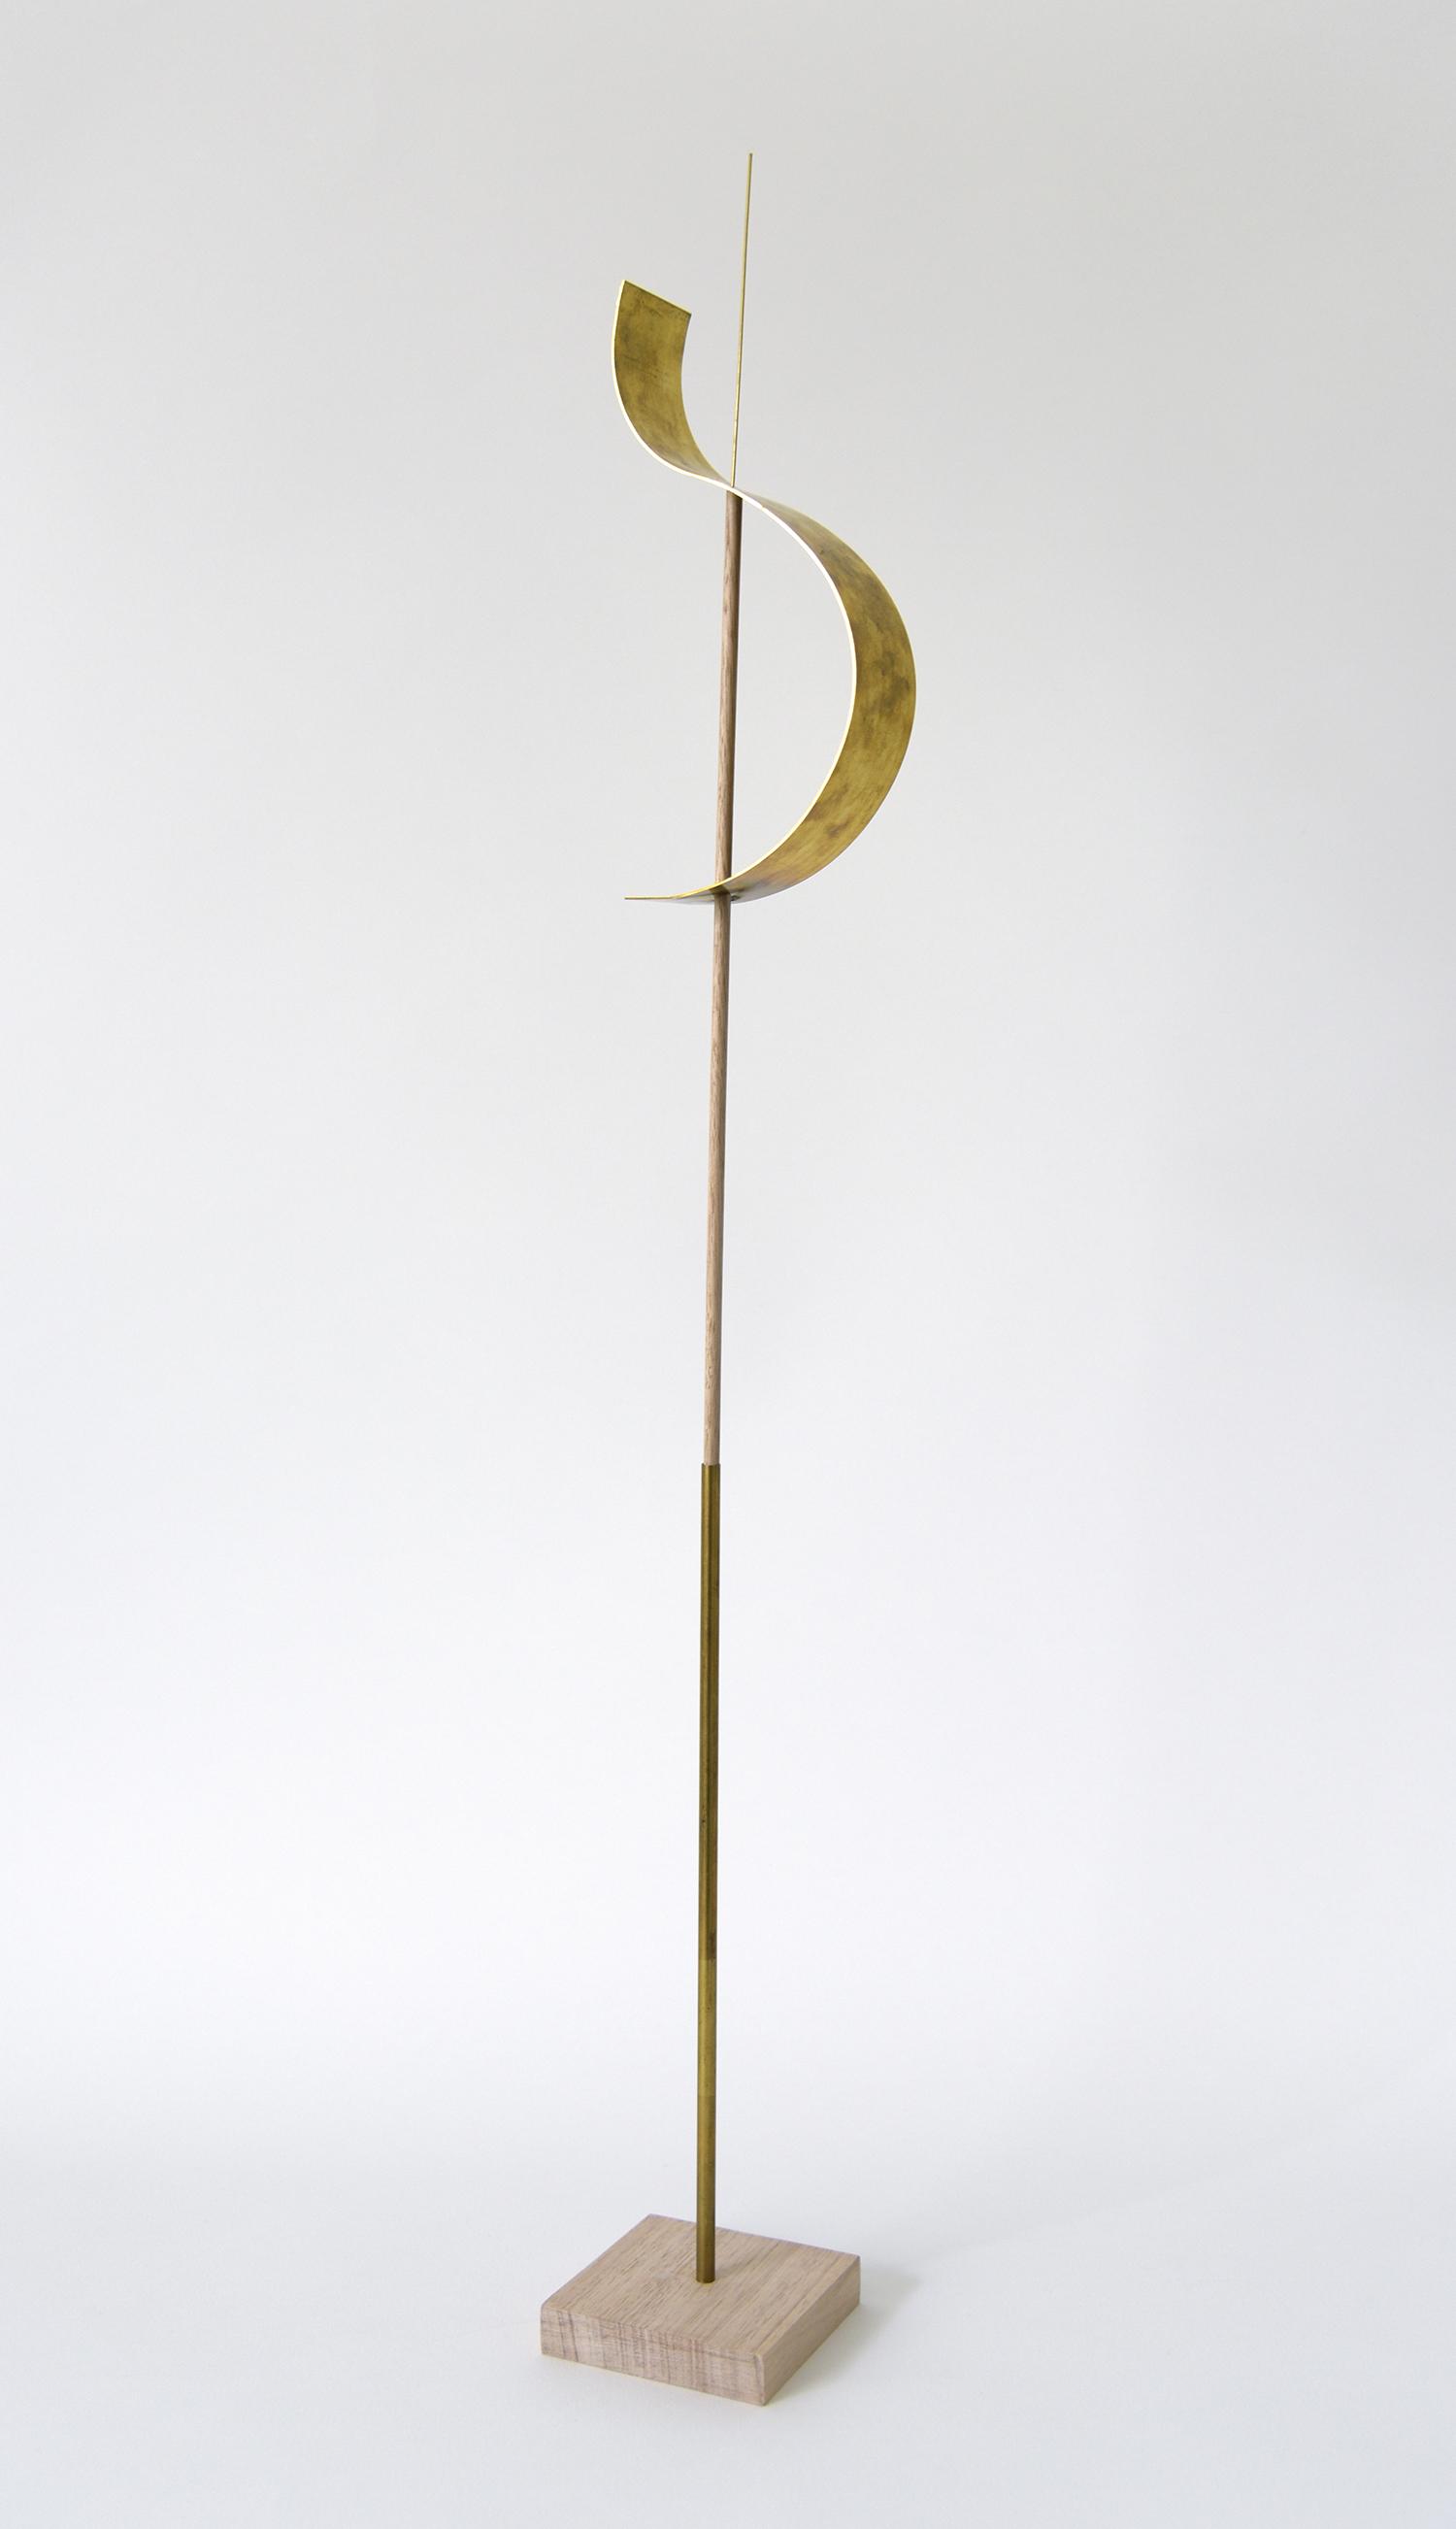 Hardbody Sculpture (Object) XII